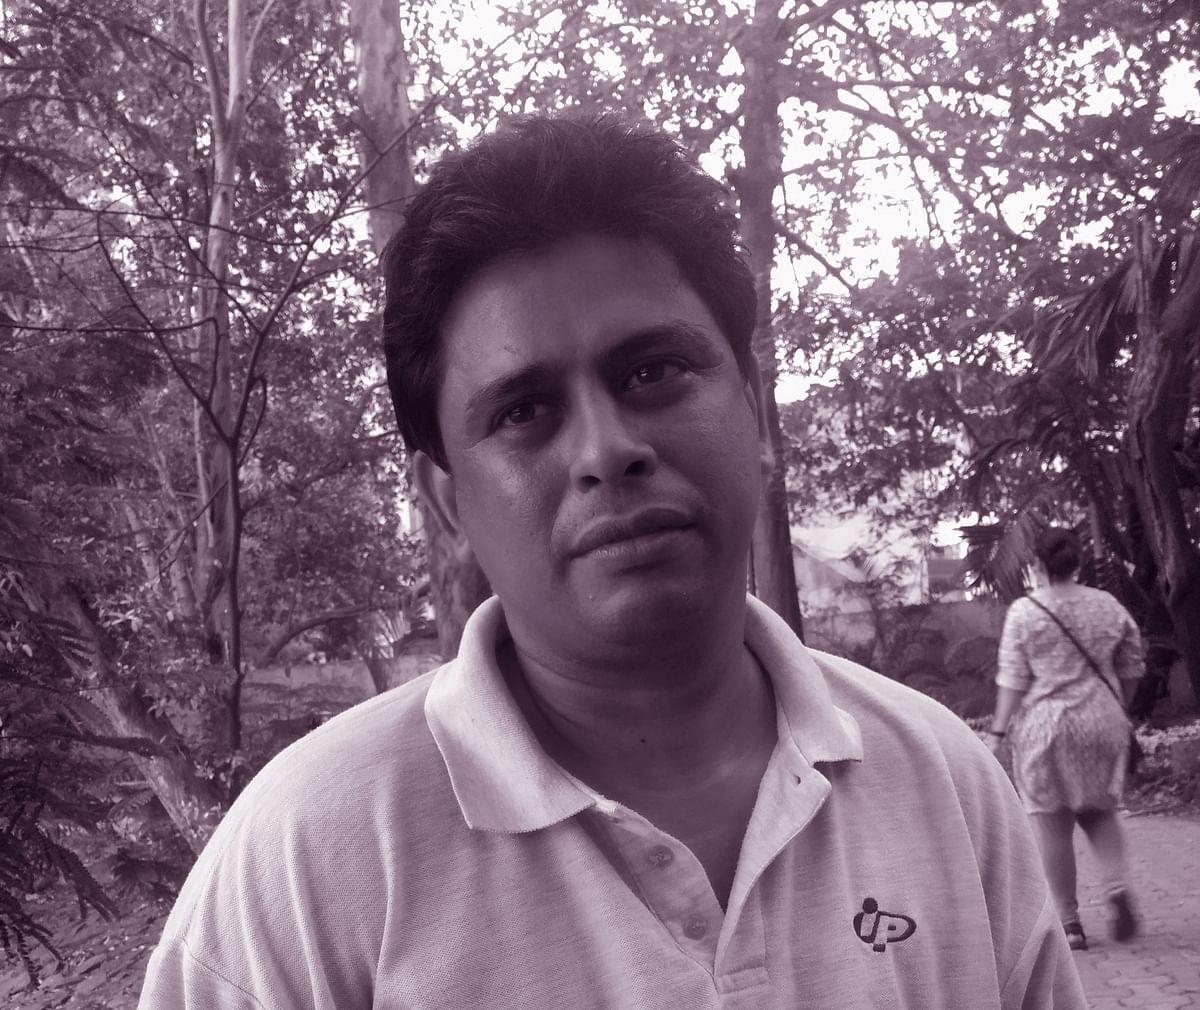 Bhima Koregaon: No incriminating evidence against me, Arun Ferreira tells Bombay HC